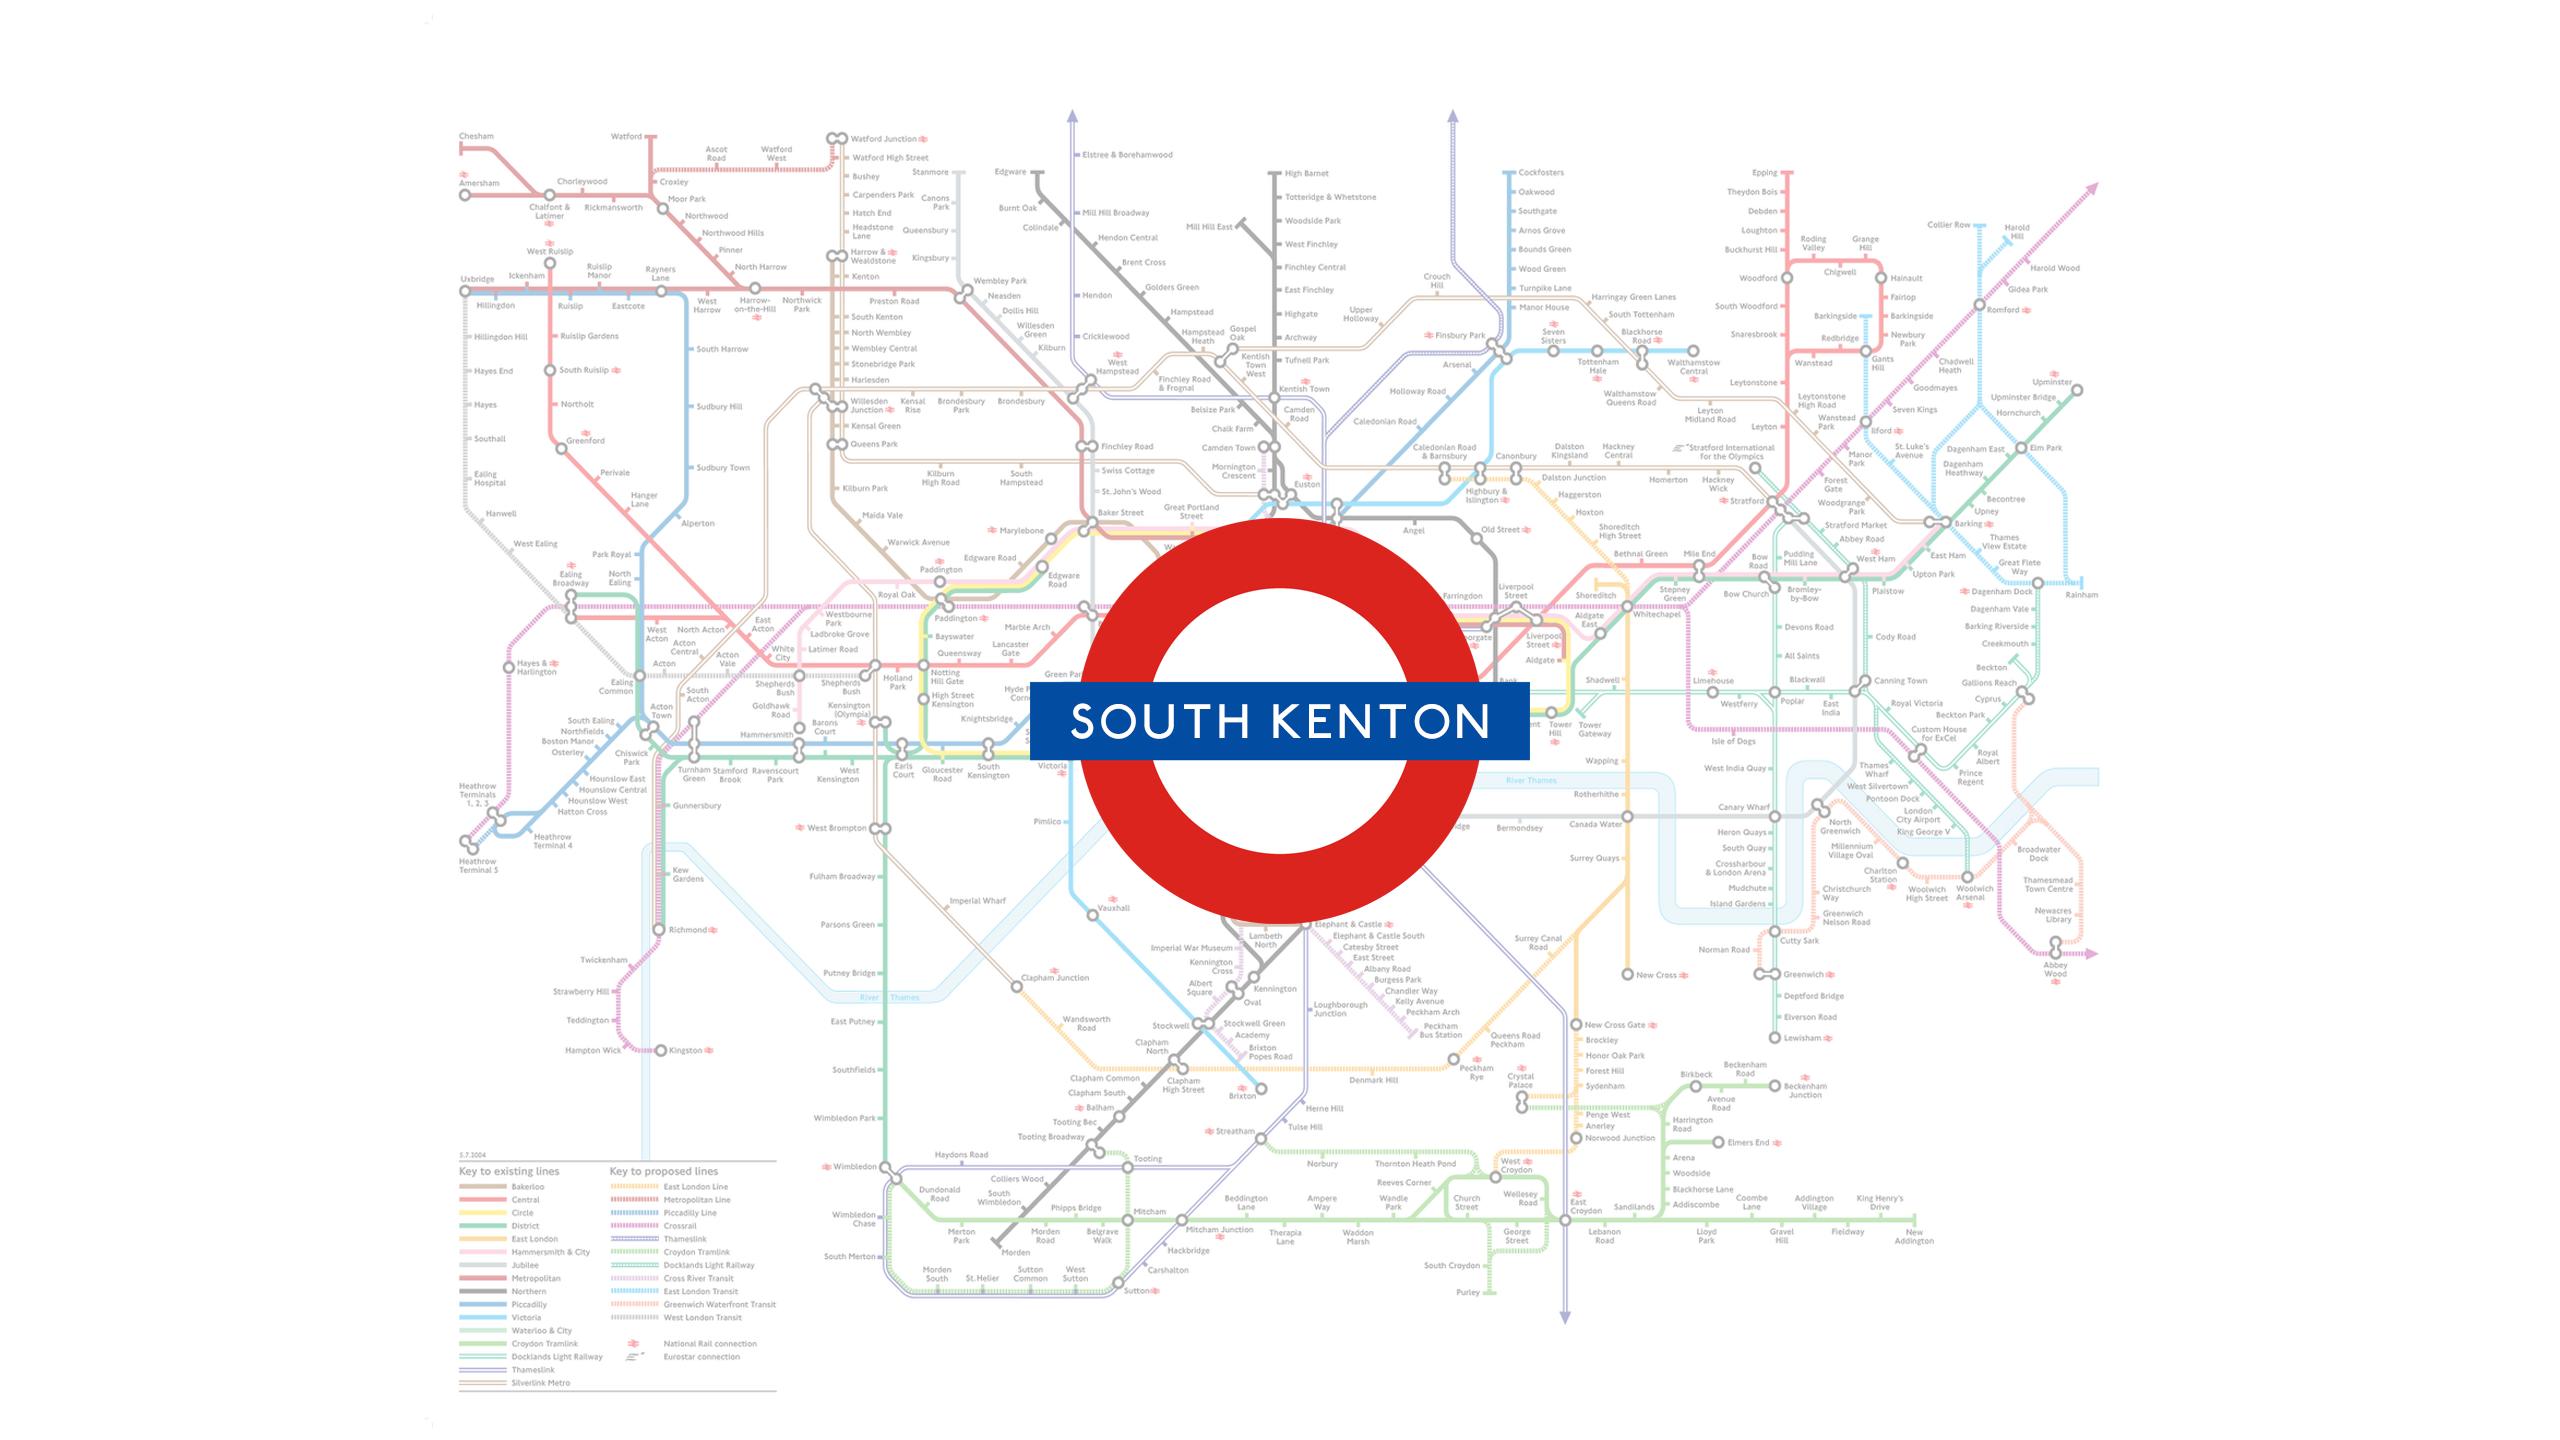 South Kenton (Map)